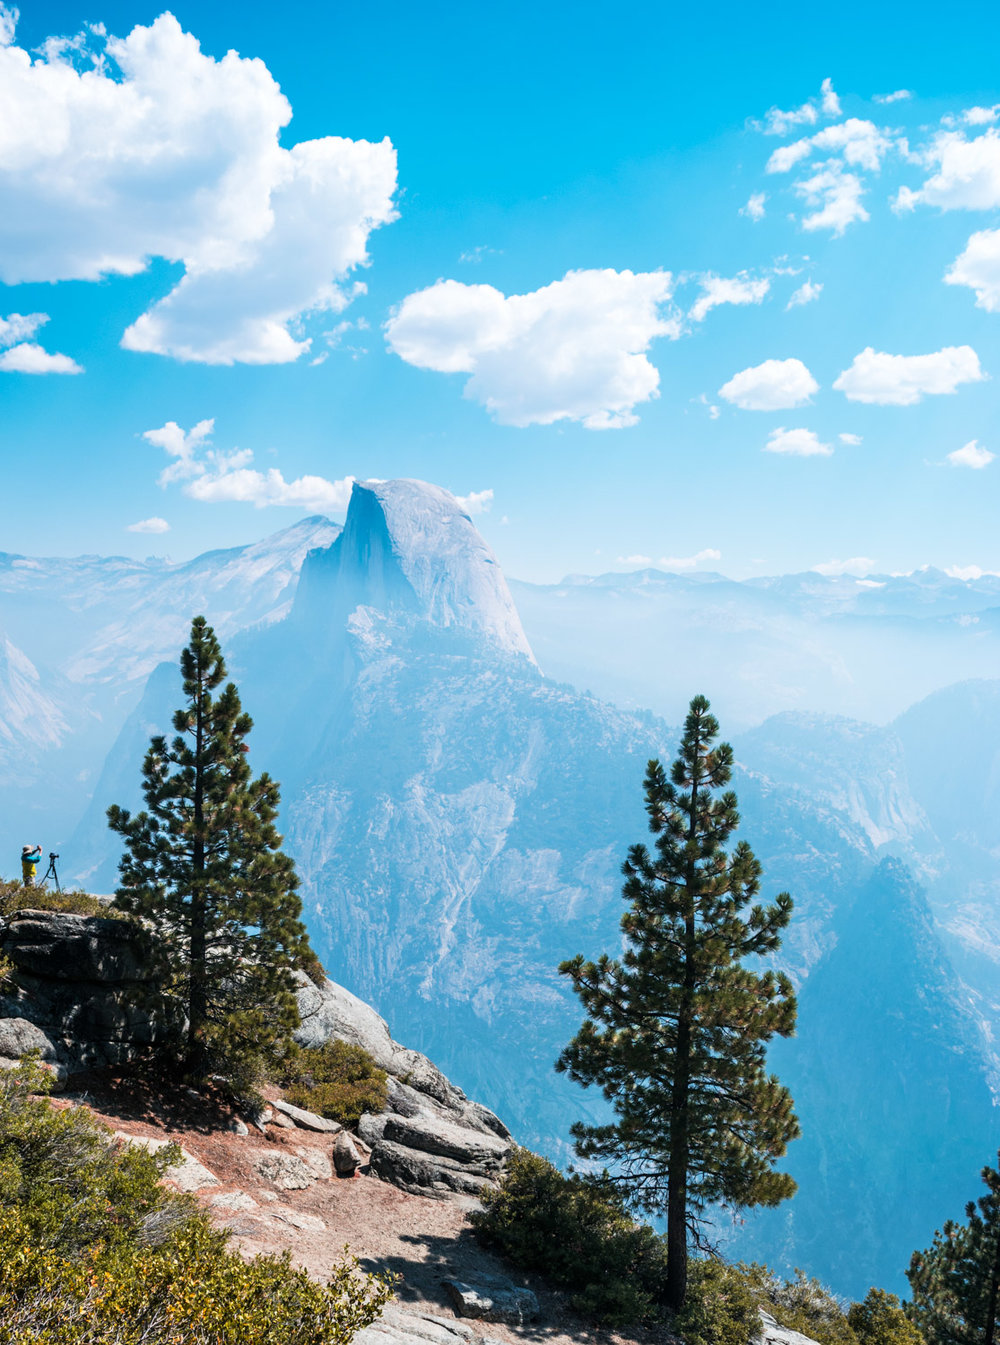 amaris-woo-photography-yosemite-california